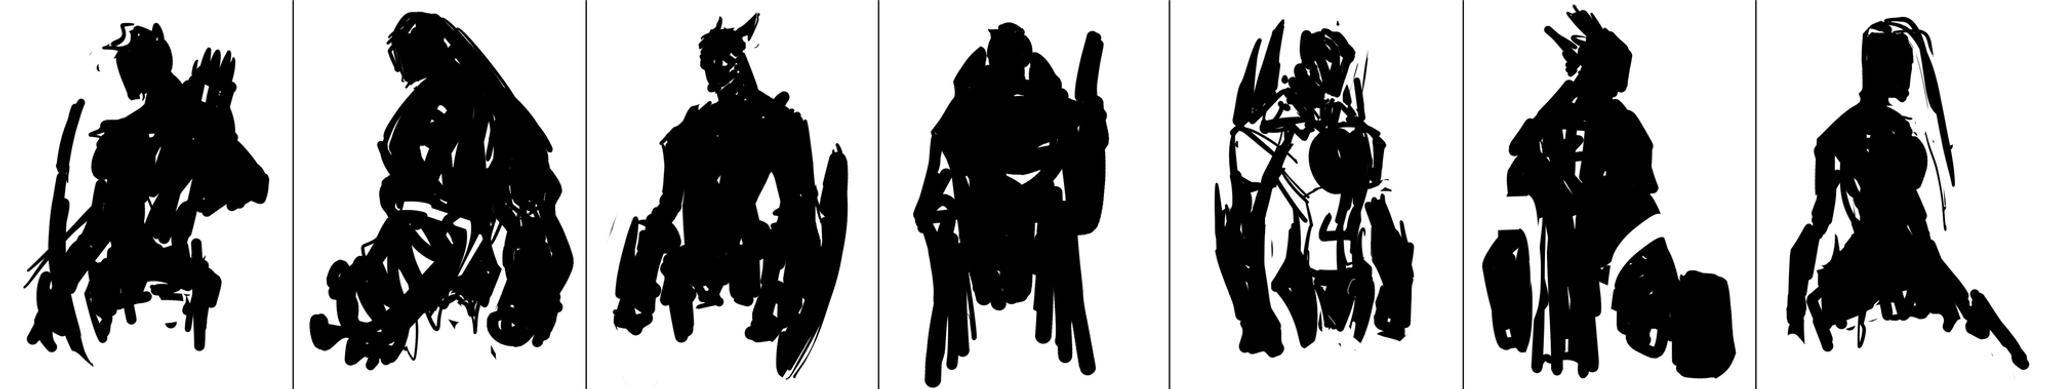 Avengers Silhouette Wallpaper Www Imgkid Com The Image